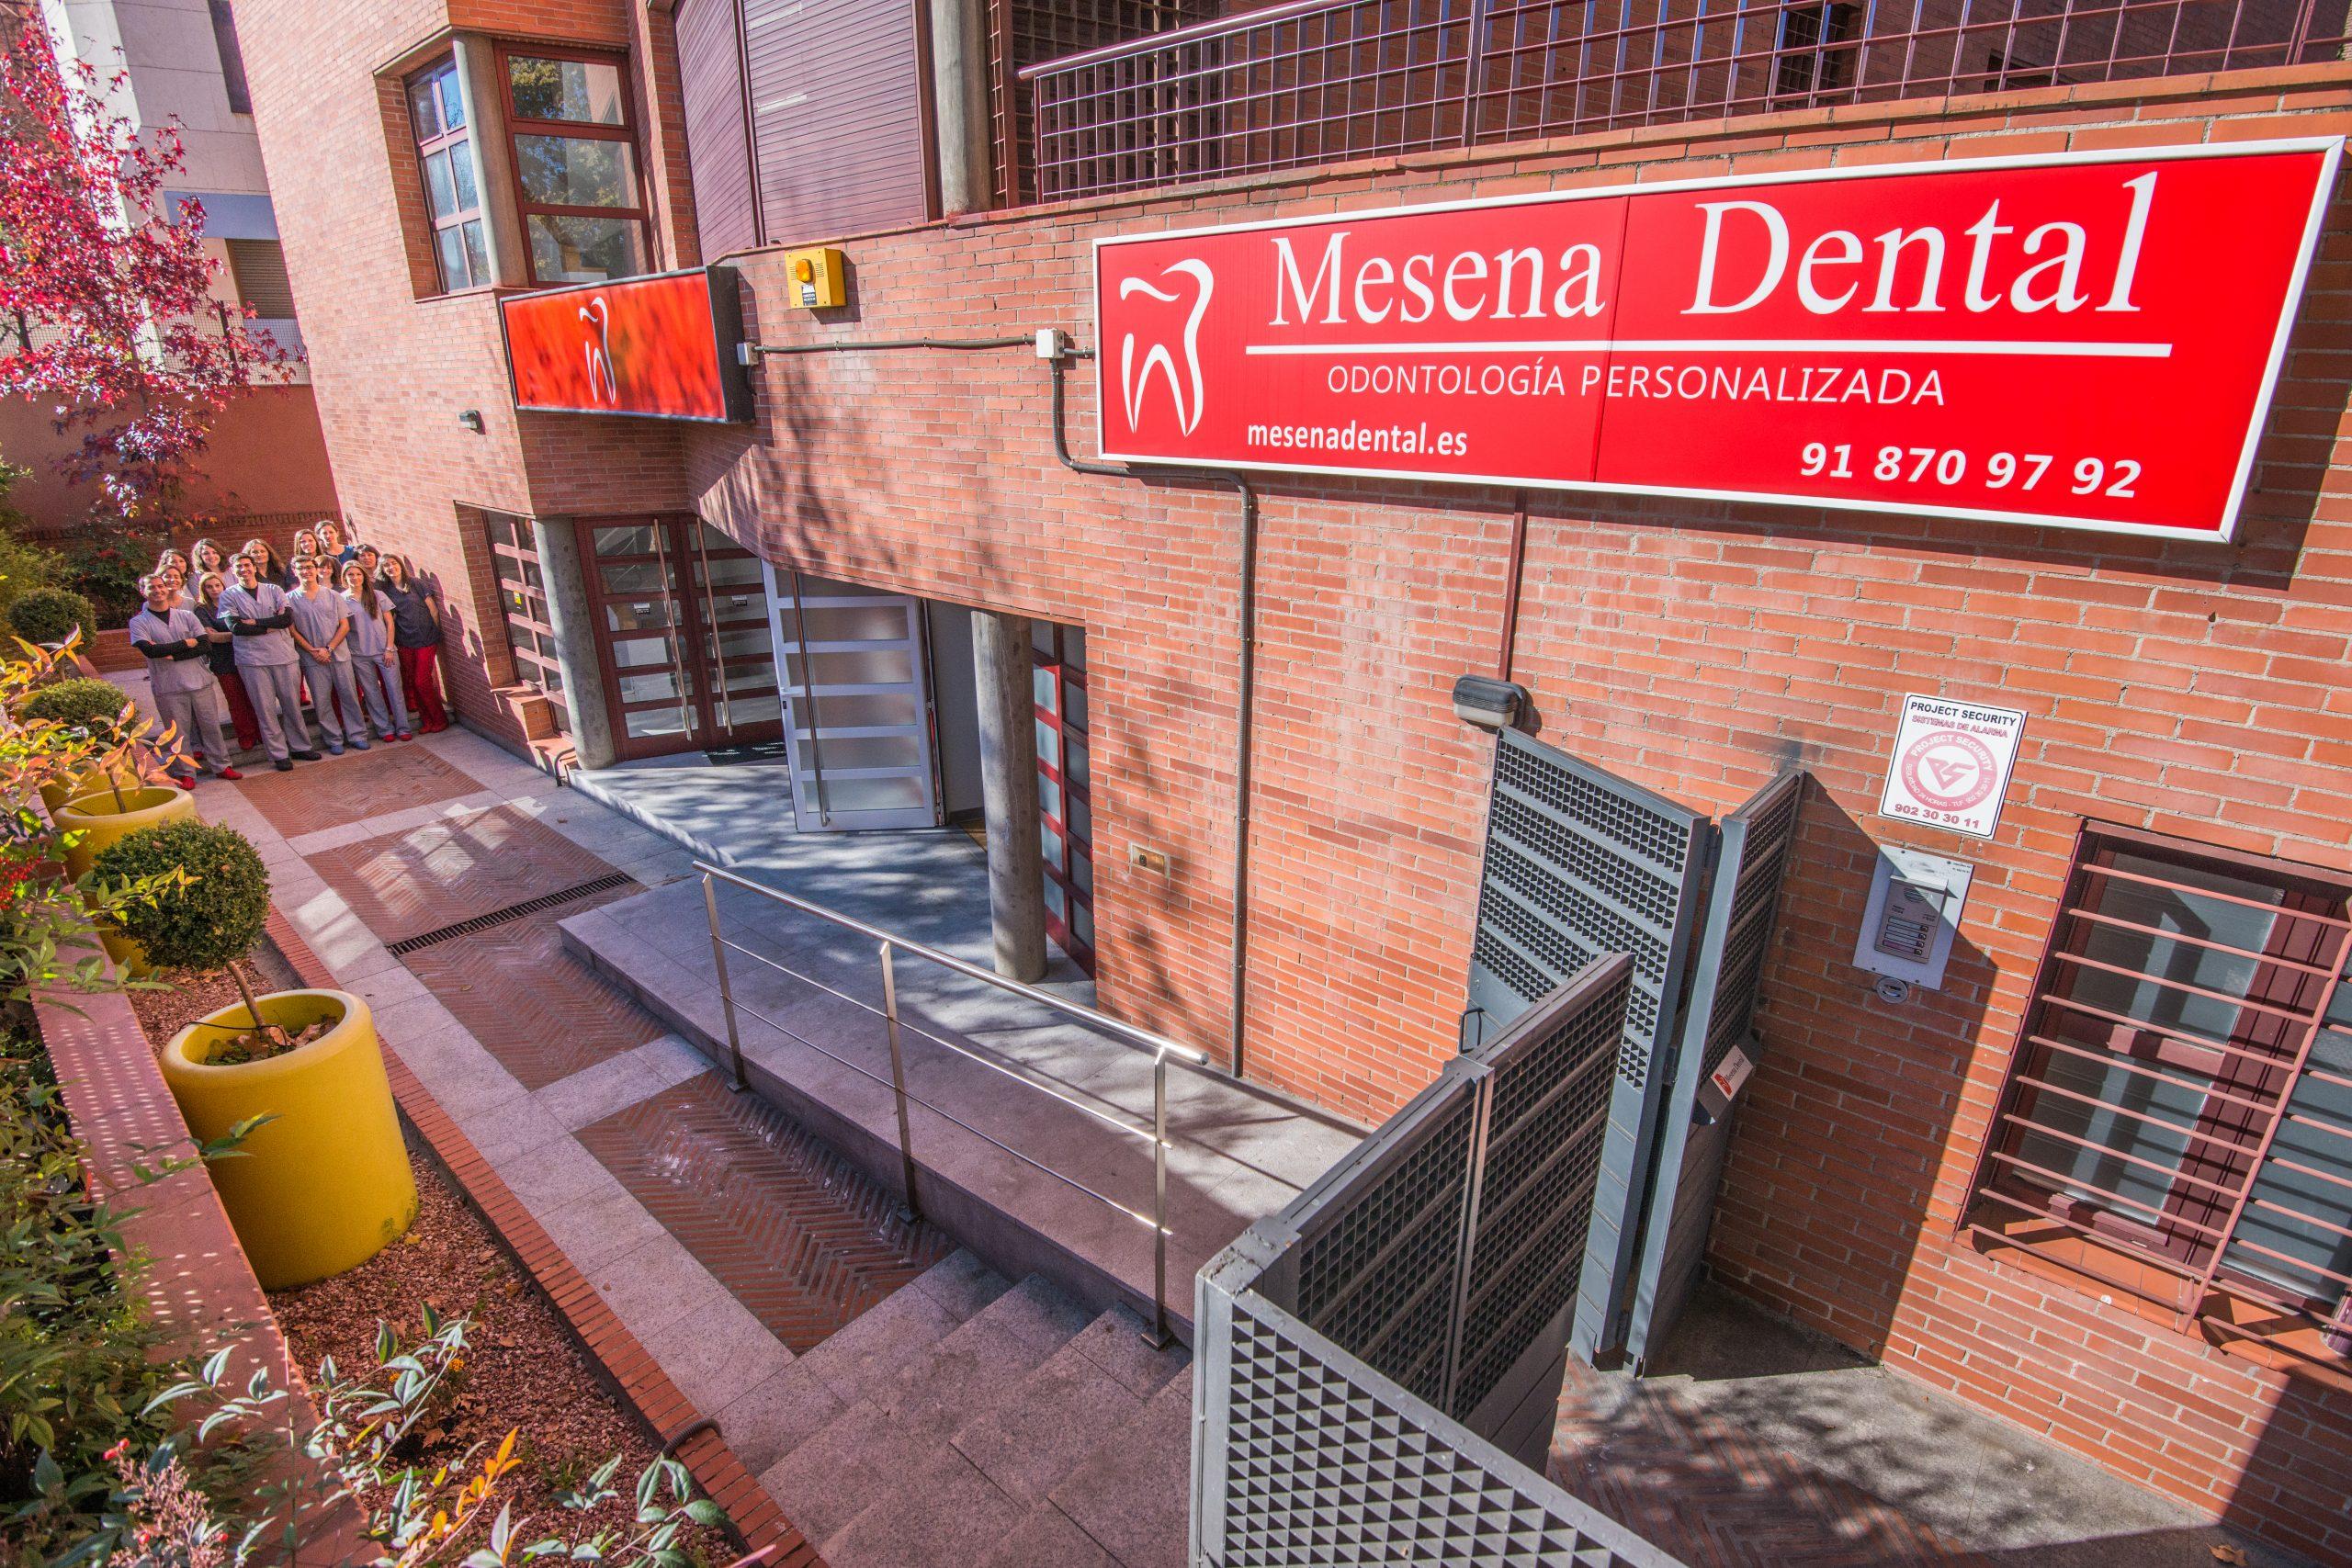 Mesena_Dental_072